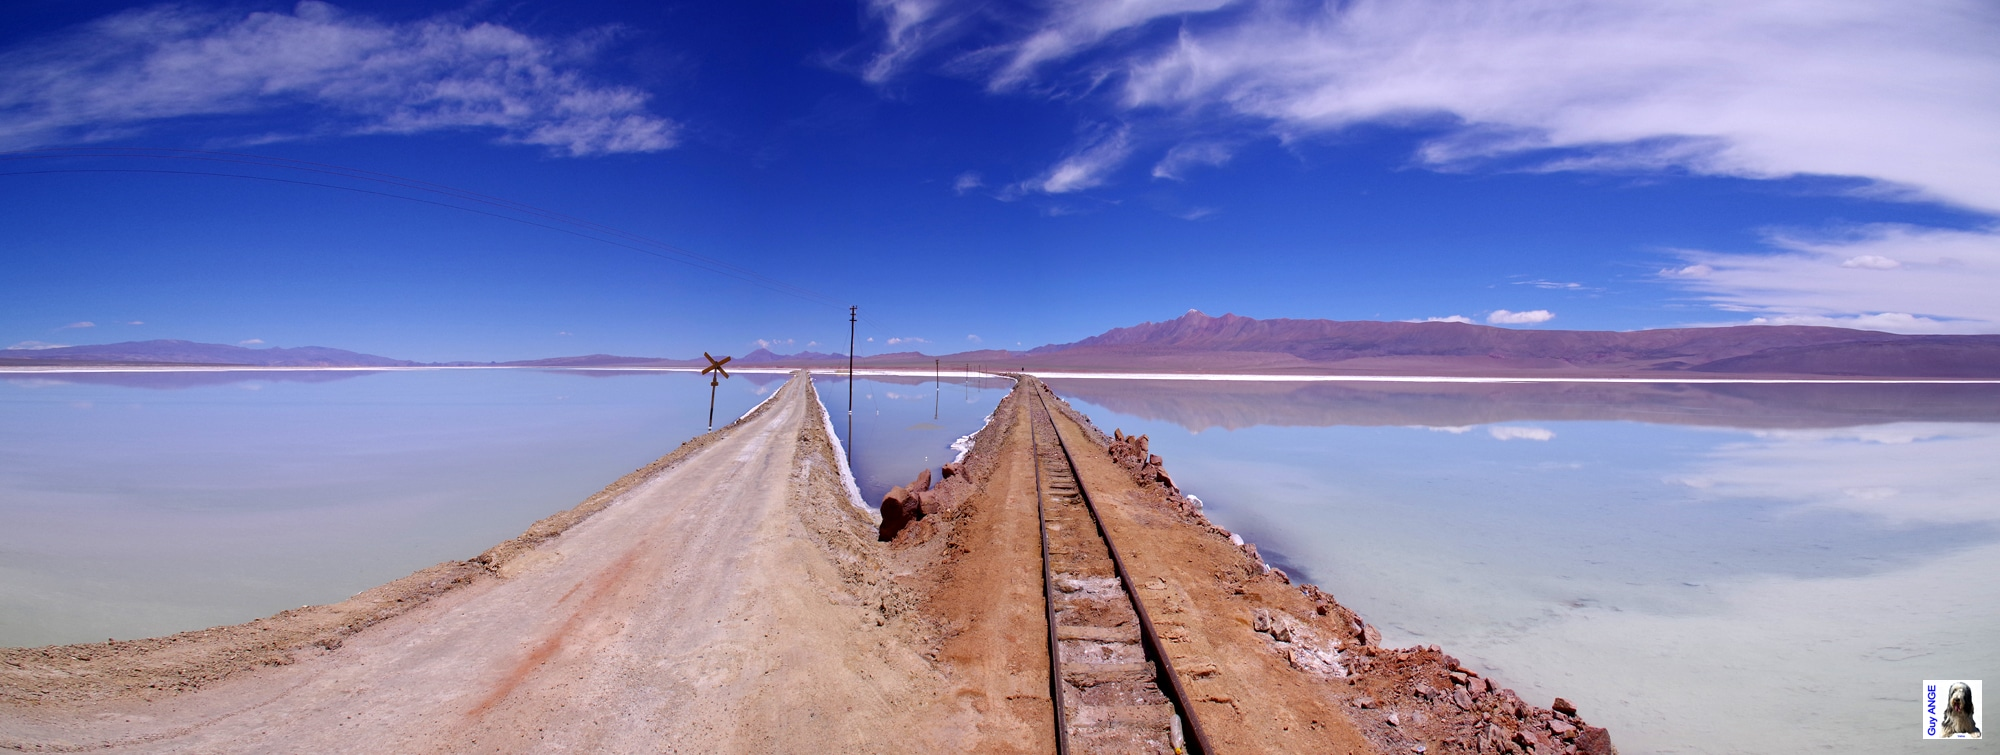 Argentine, région de la Puna, la Laguna Seca.